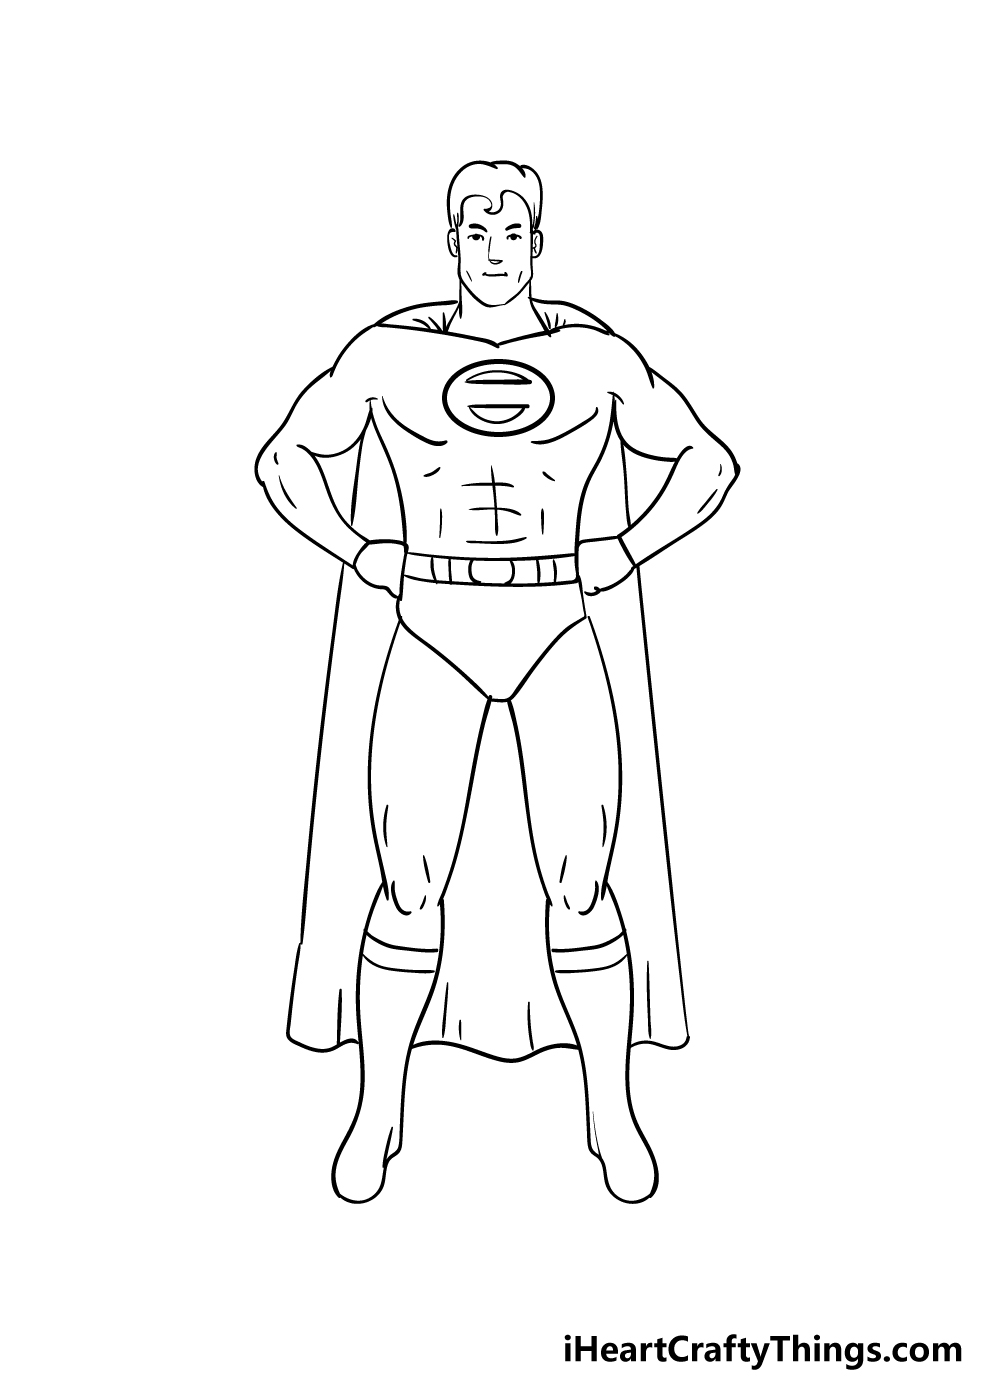 superhero drawing step 7